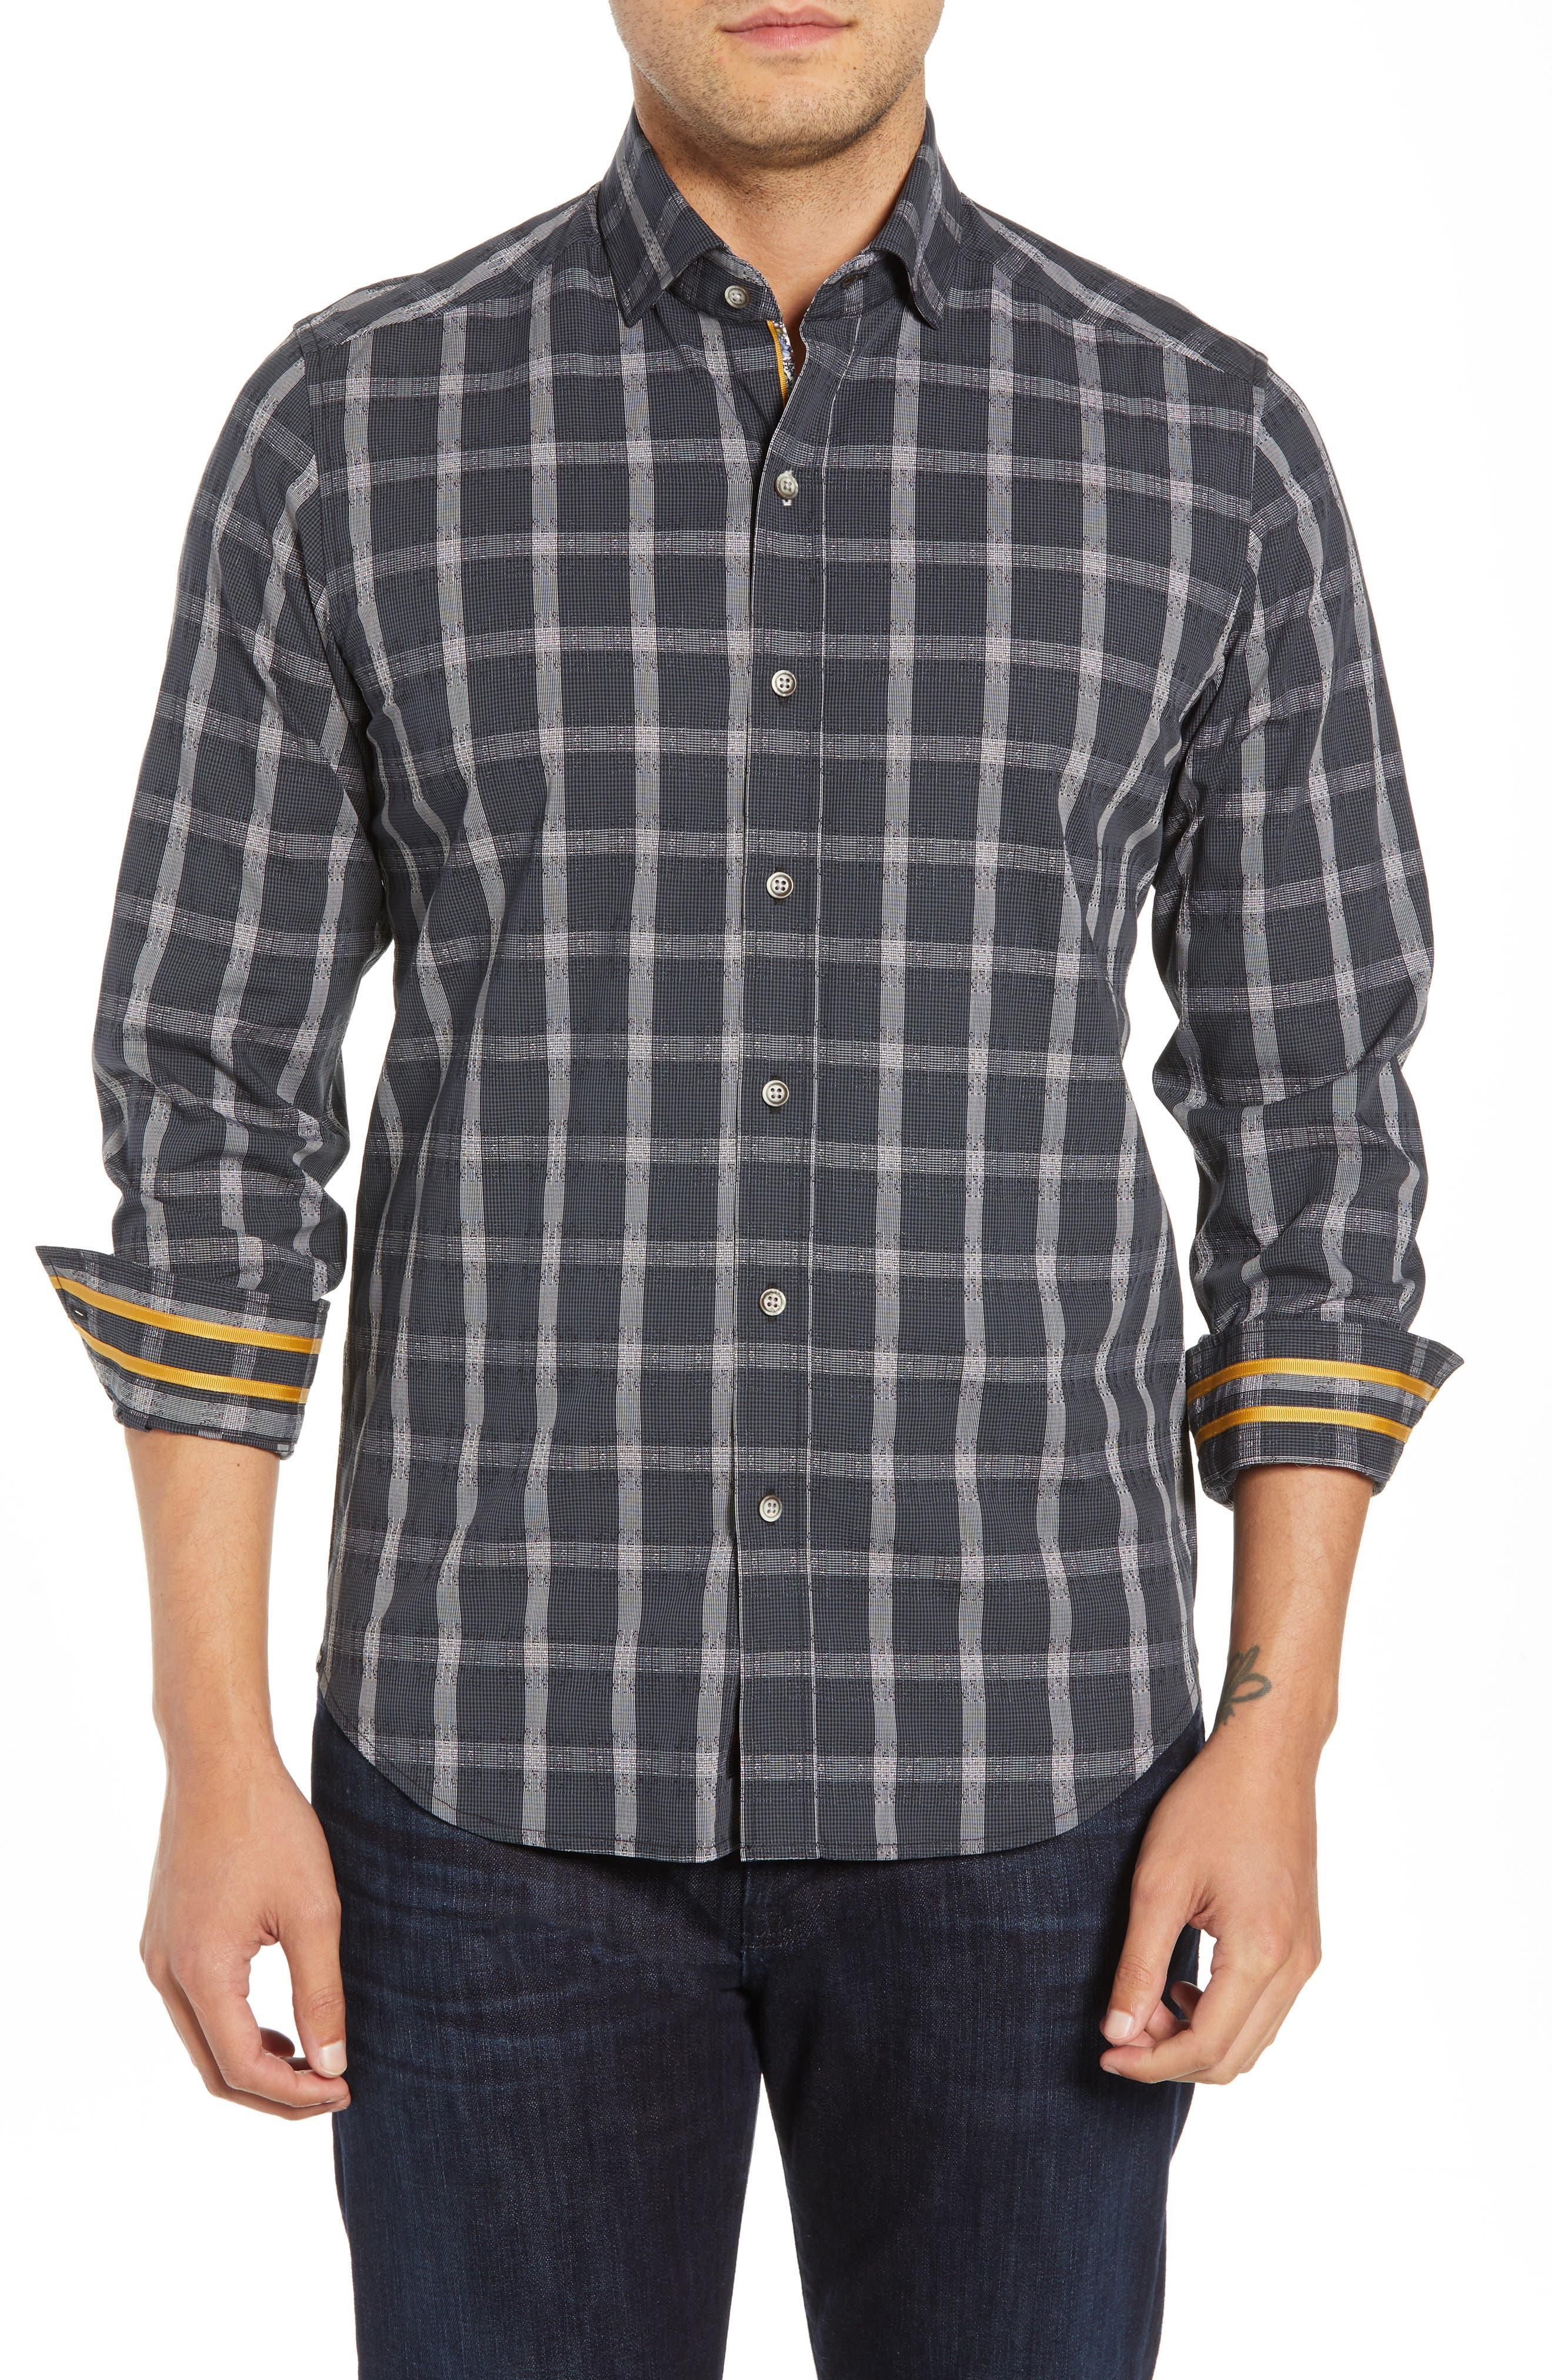 Jenson Tailored Fit Sport Shirt,                         Main,                         color, BLACK